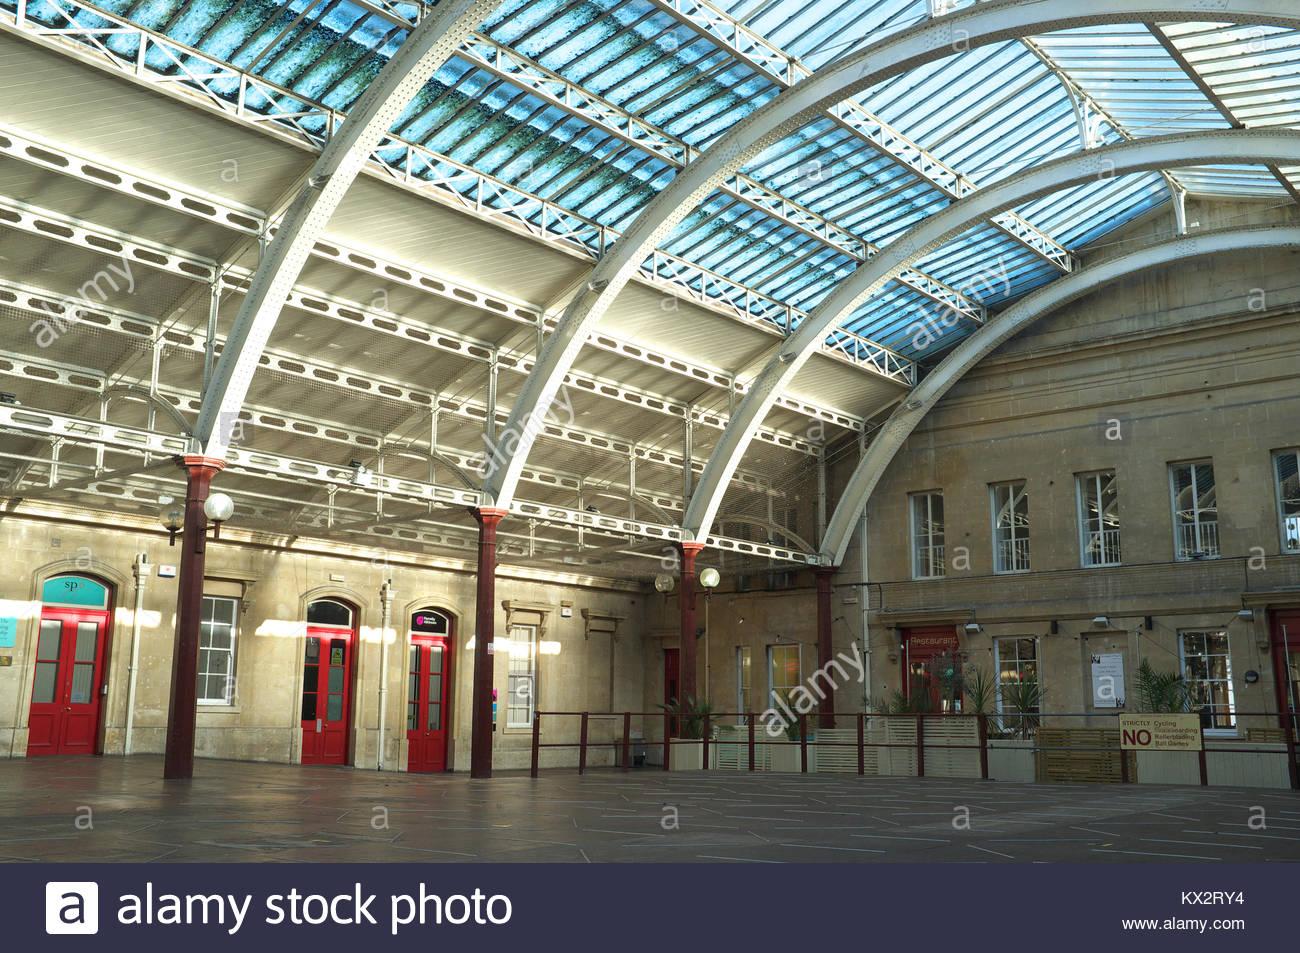 Hillingdon Tube Station Car Park